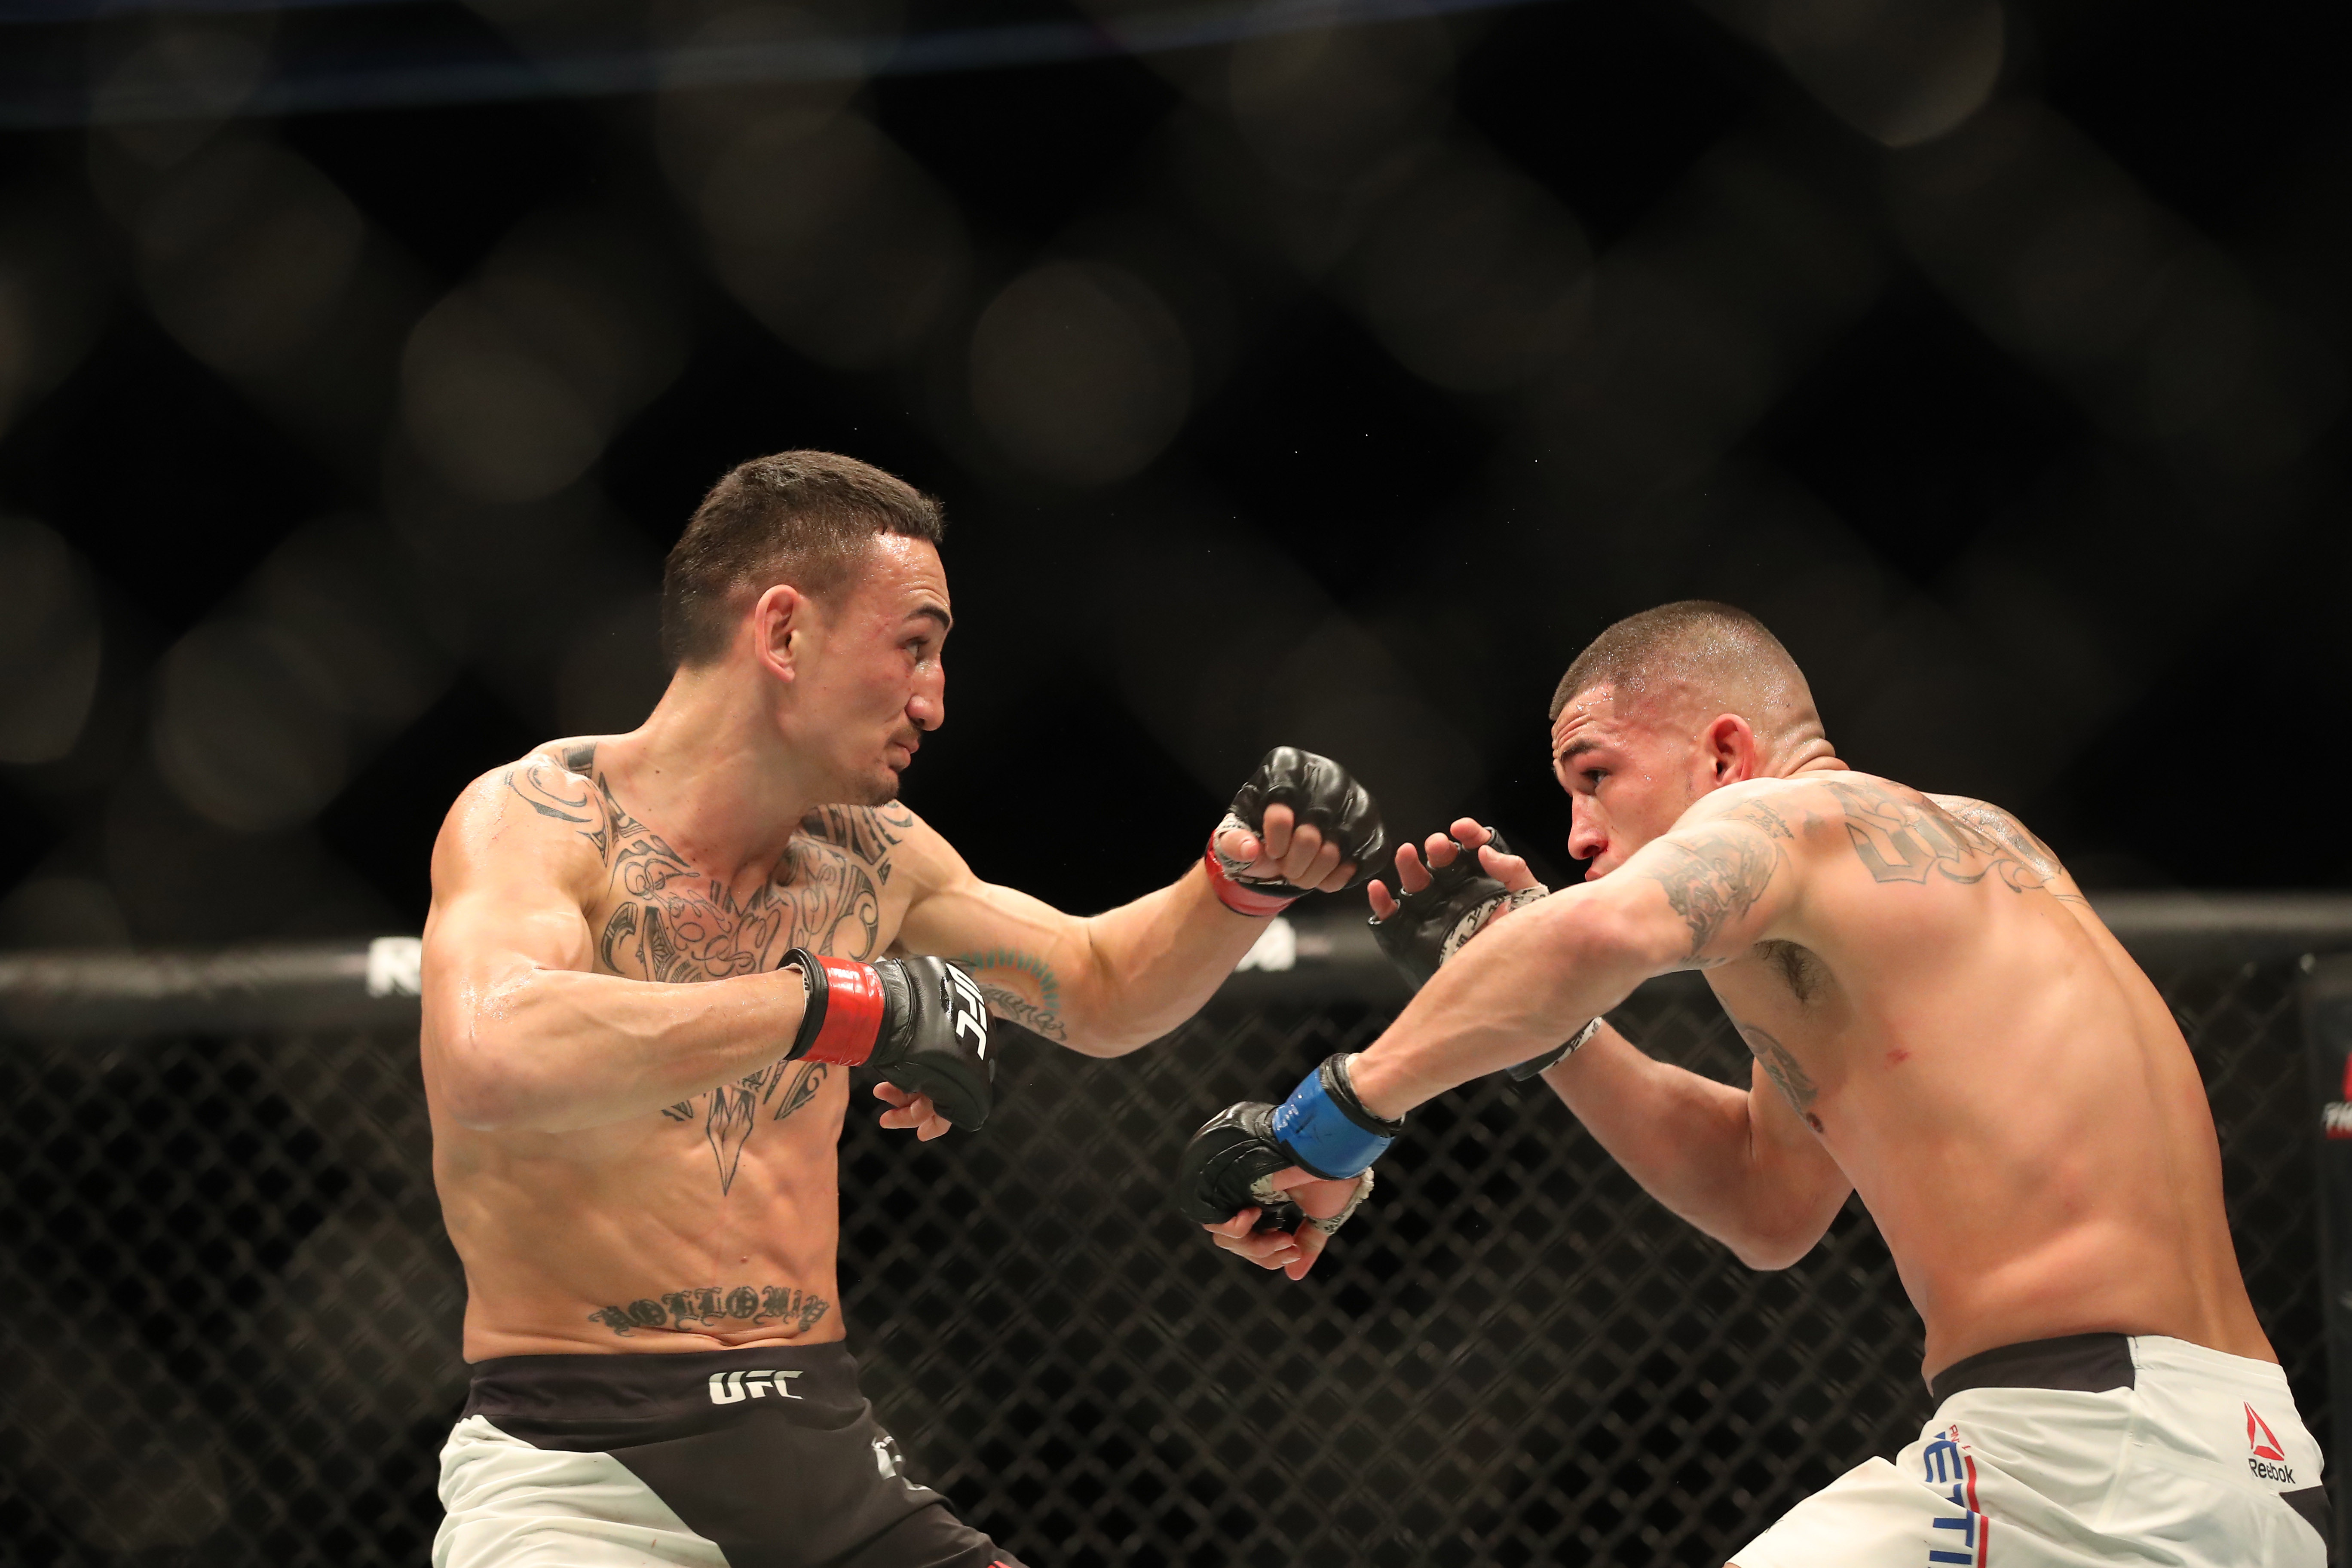 MMA: UFC 206- Holloway vs Pettis